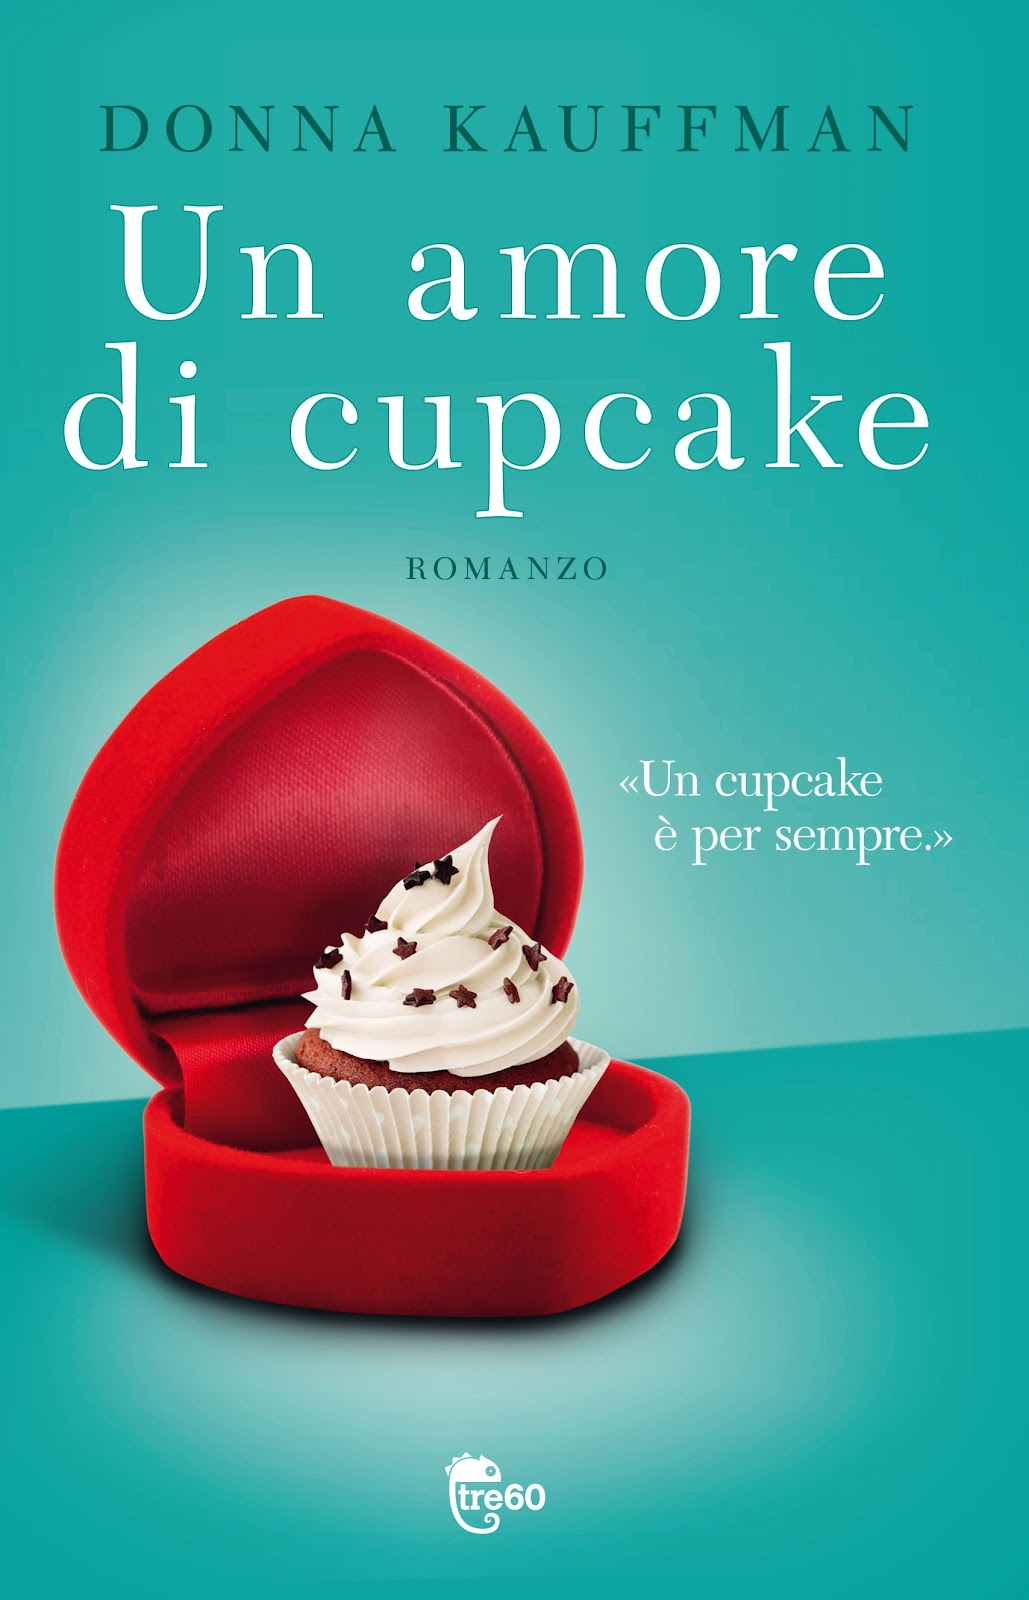 un_amore_di_cupcake.jpg